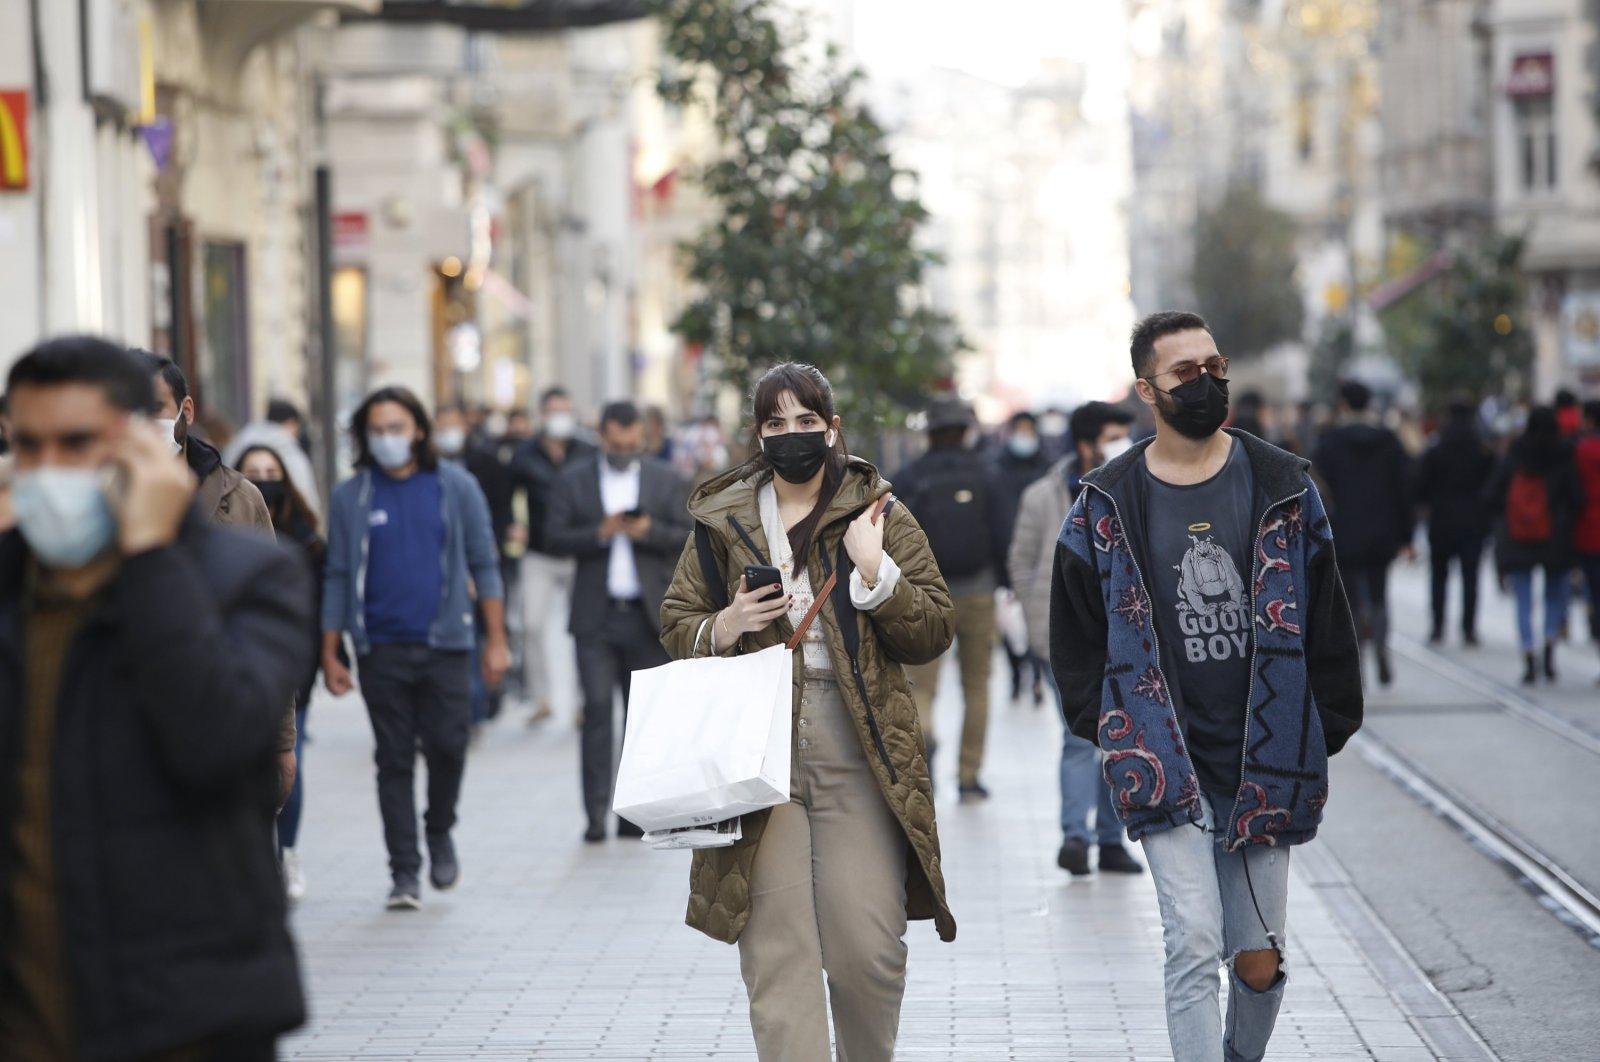 People walk down the popular shopping destination, Istiklal Avenue, in Istanbul, Turkey, Dec. 13, 2020. (Photo by Murat Şengül)